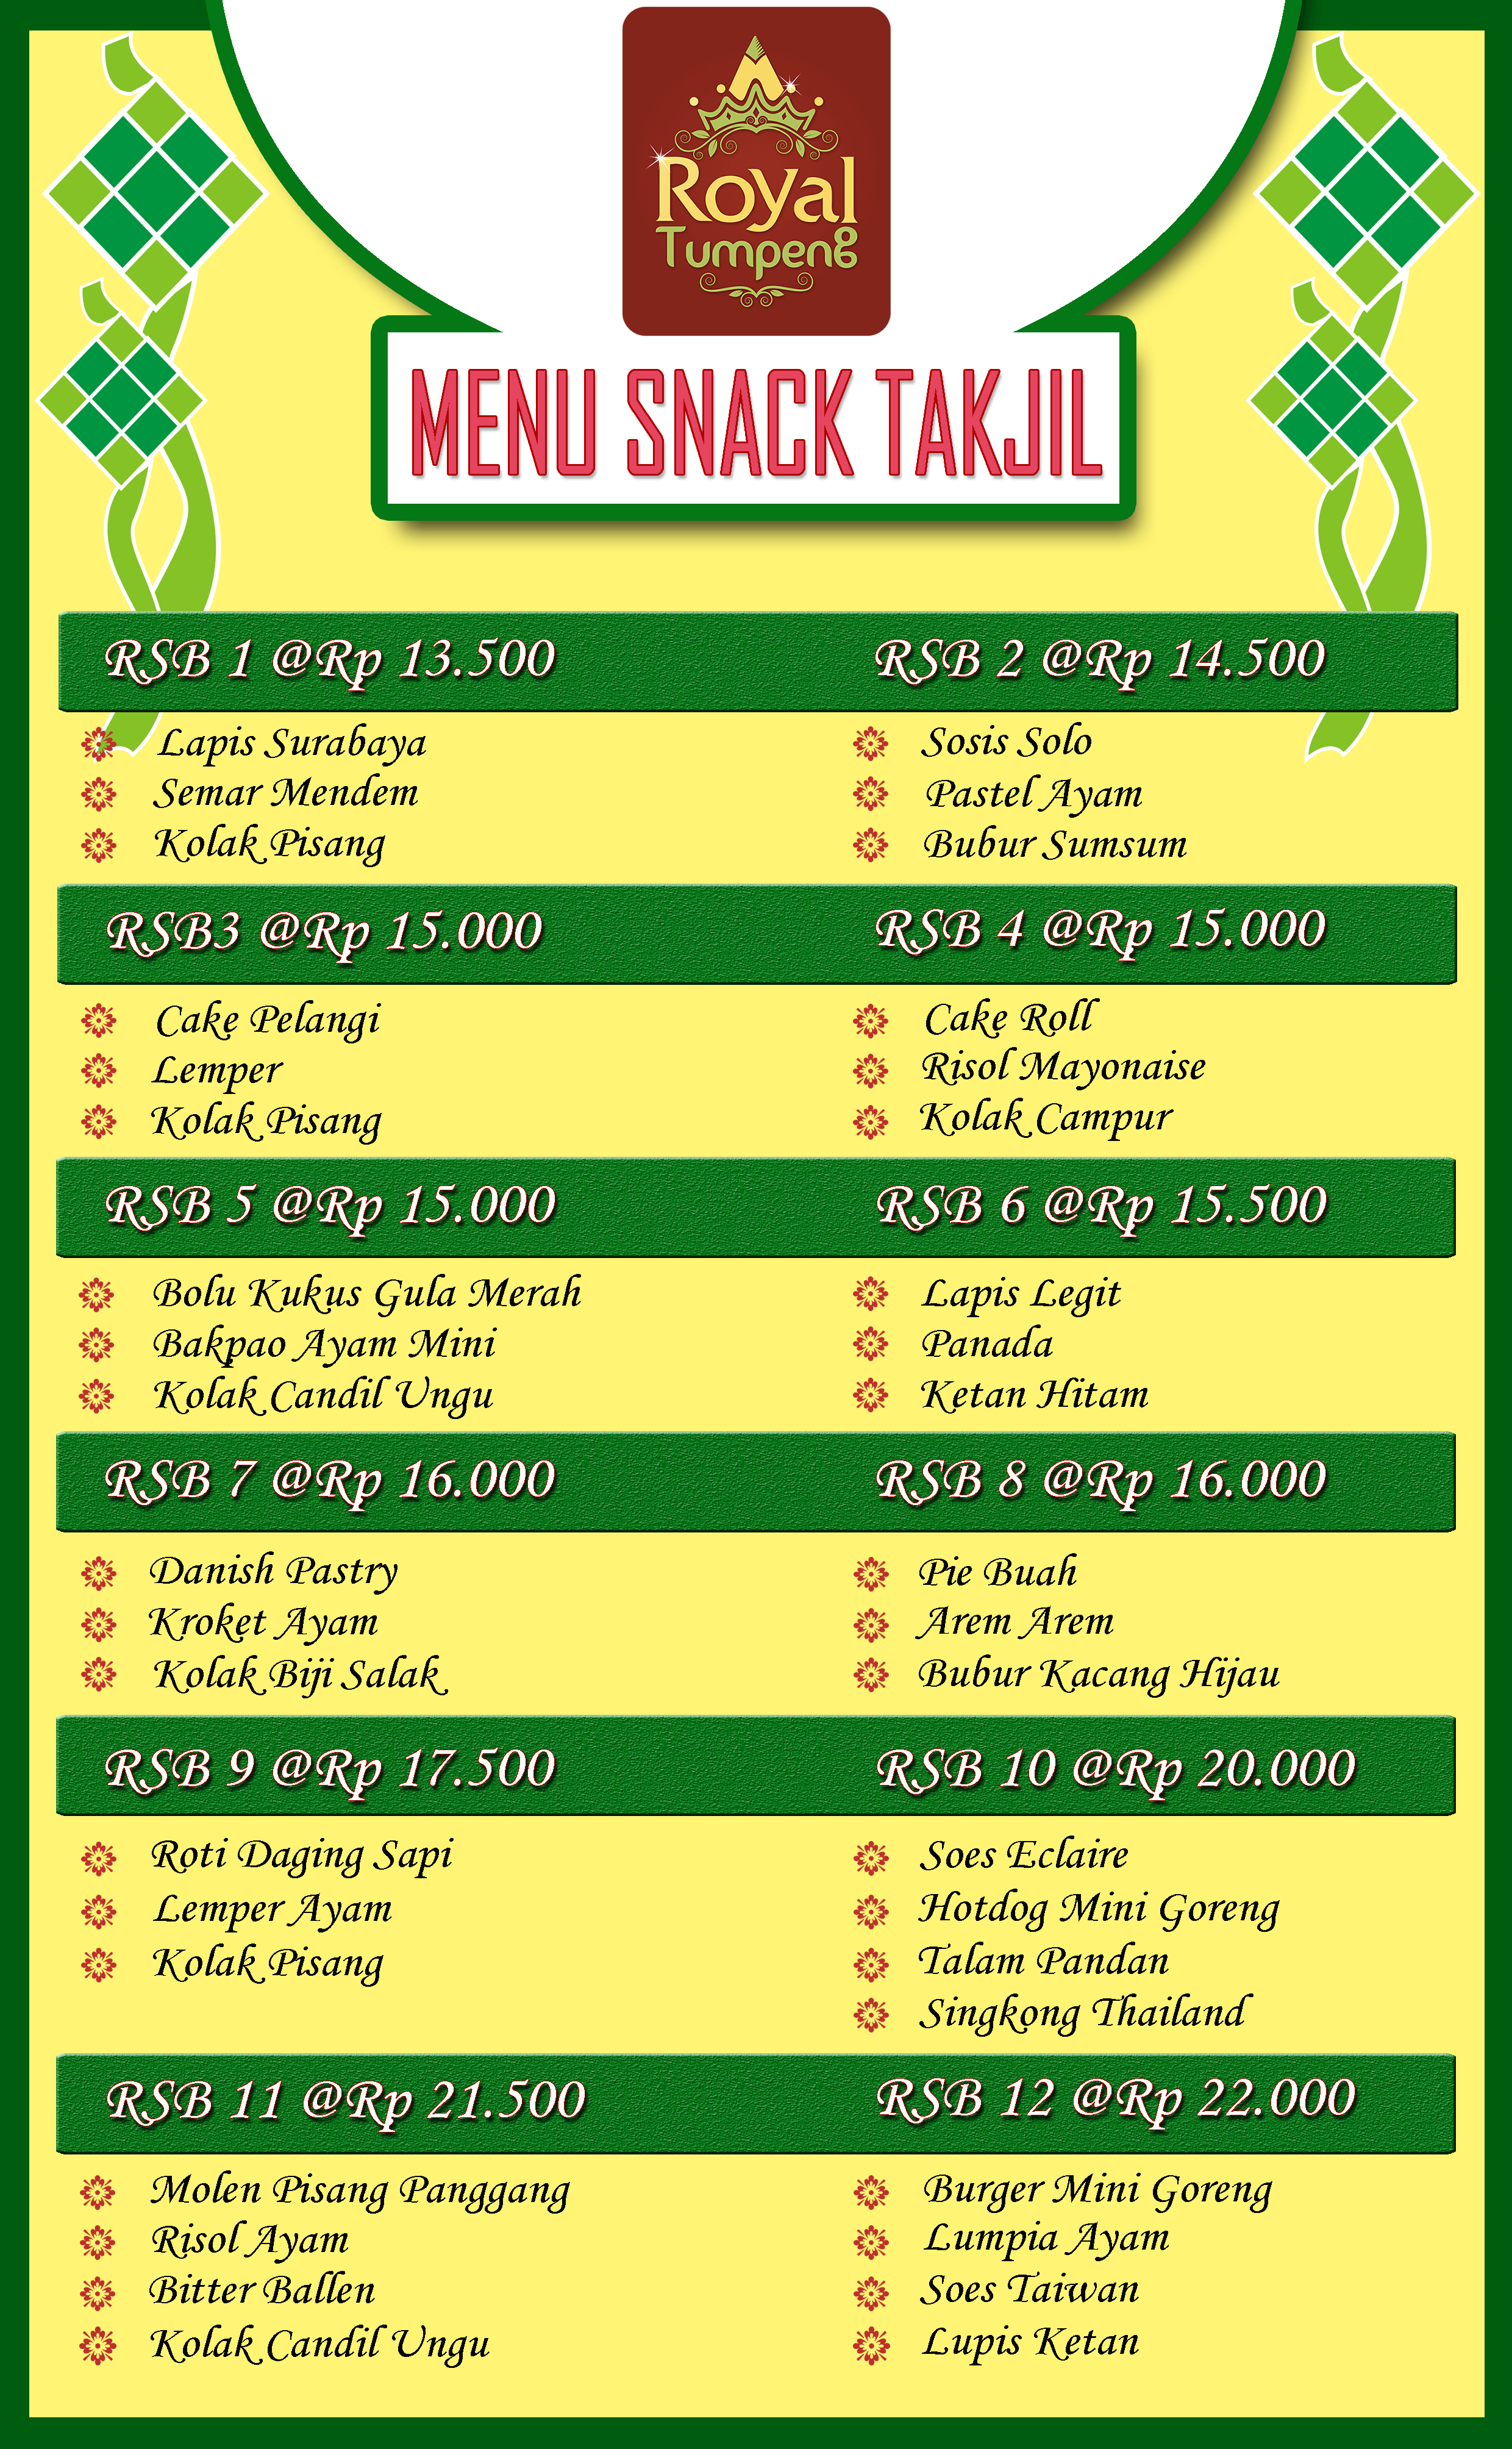 Paket Snack Takjil RT